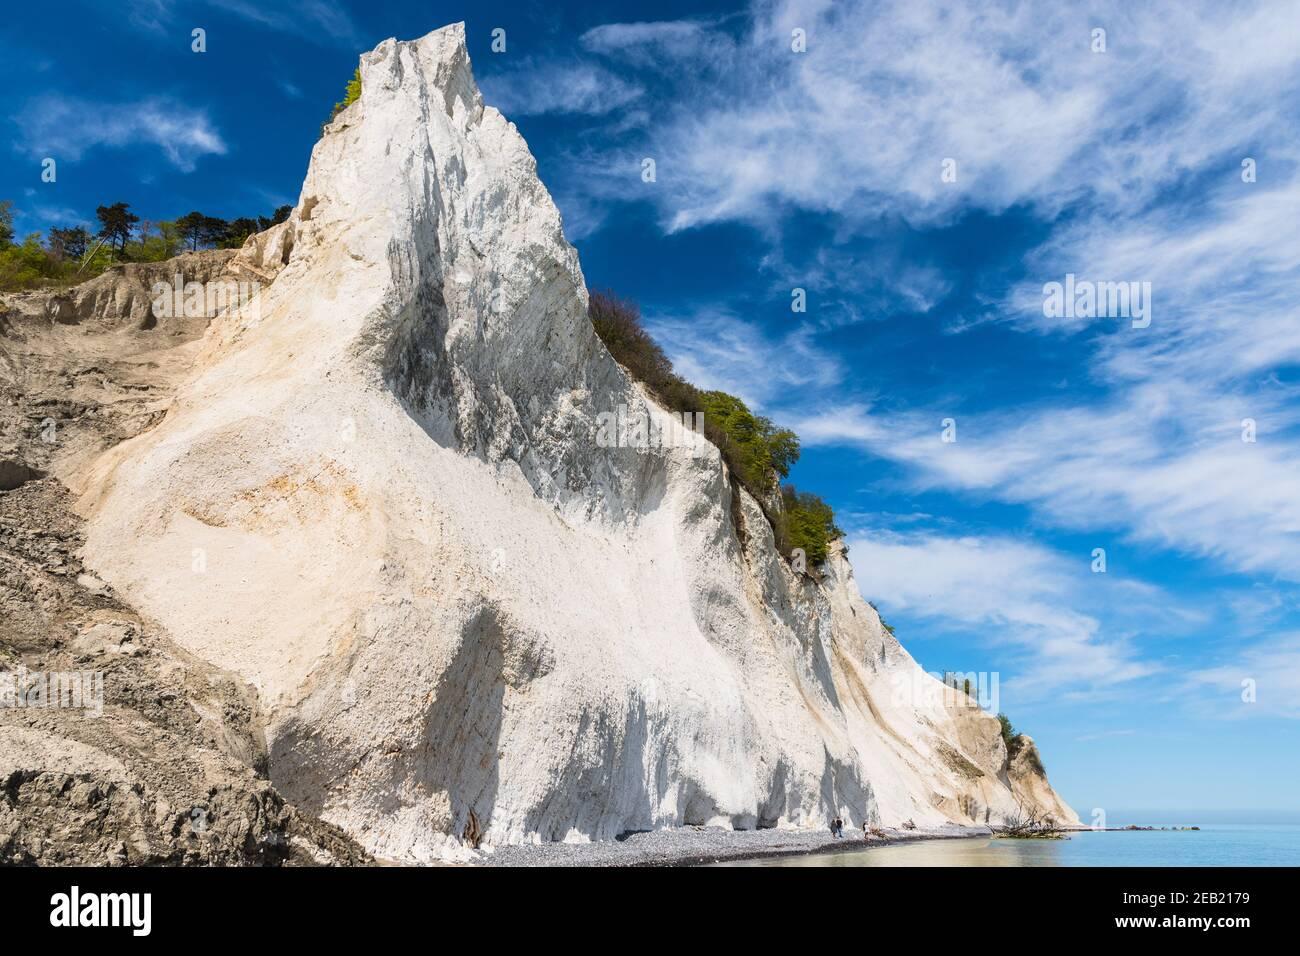 Moens klint chalk cliffs in Denmark Stock Photo